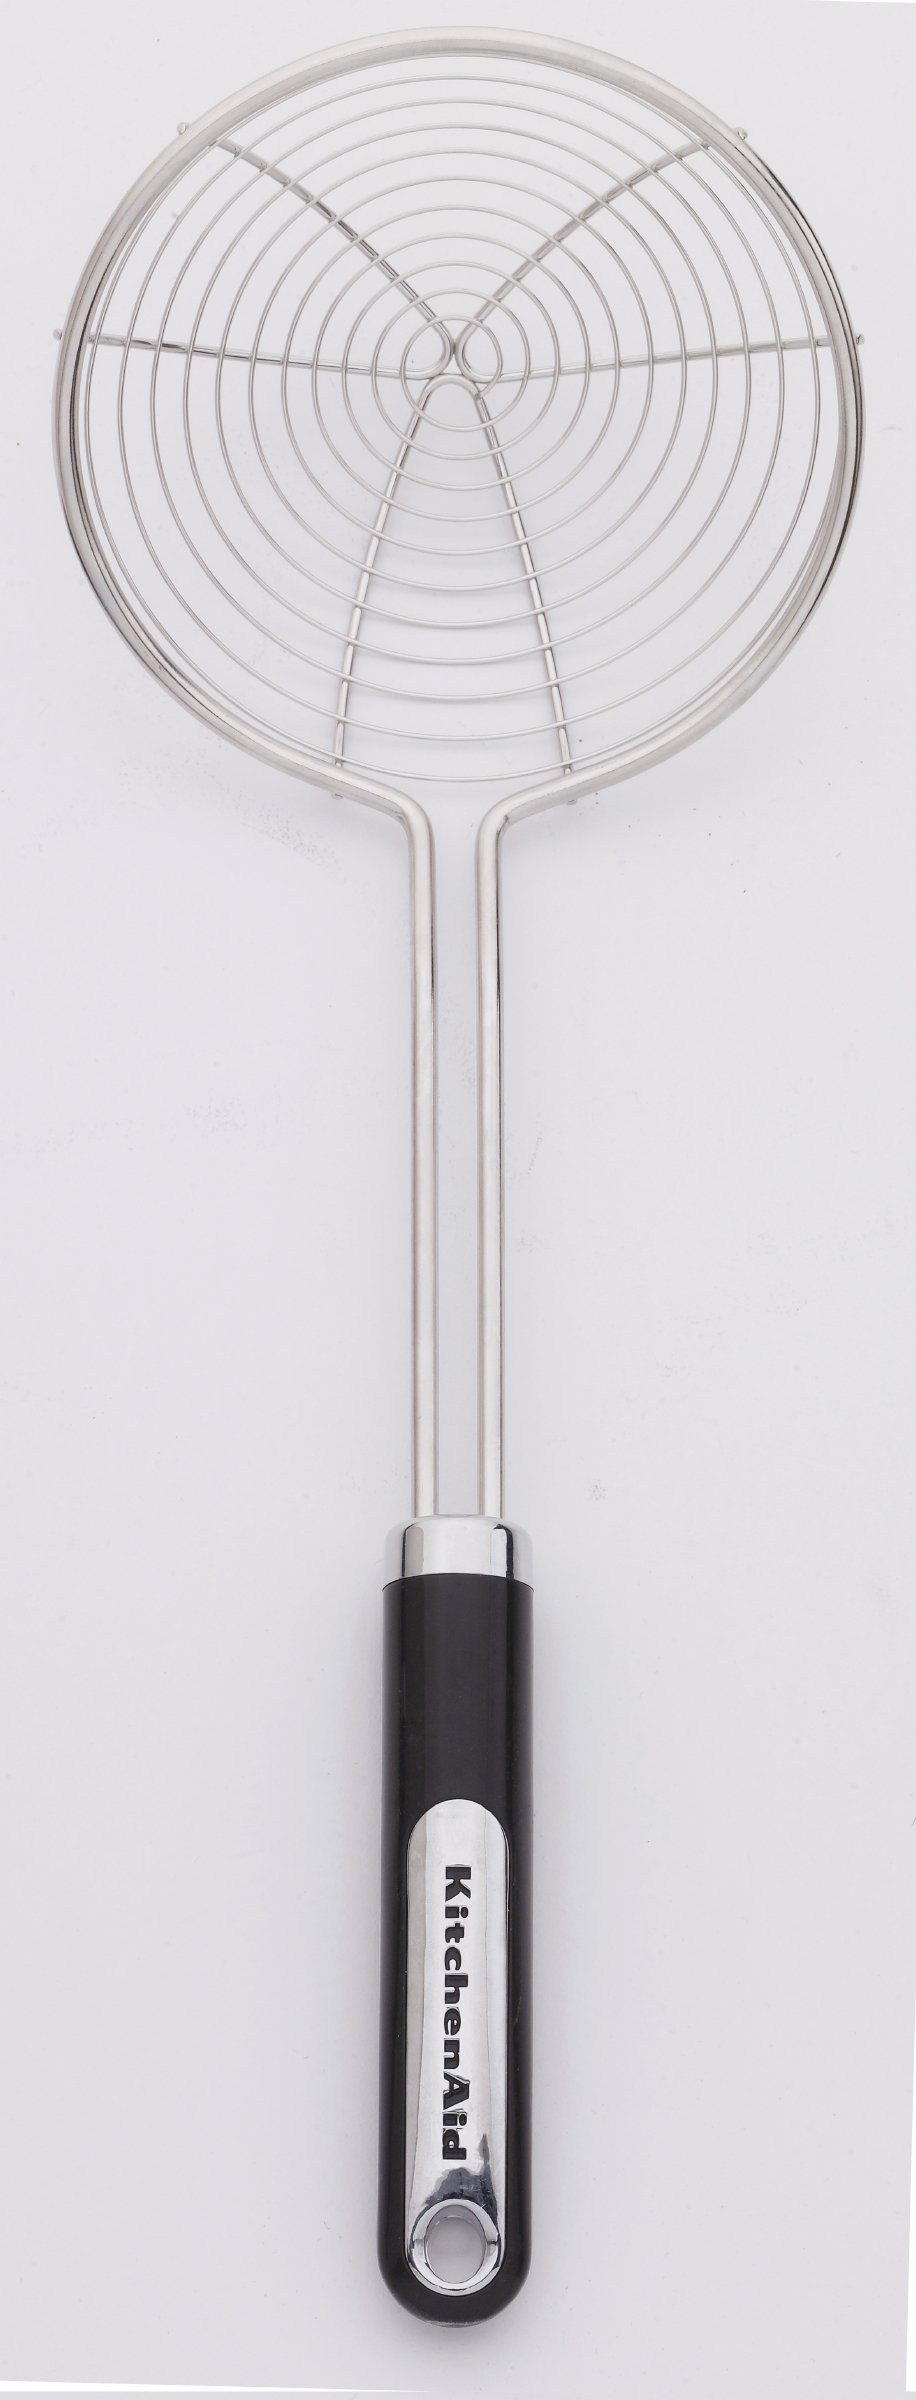 KitchenAid Asian Strainer, Black by KitchenAid (Image #3)